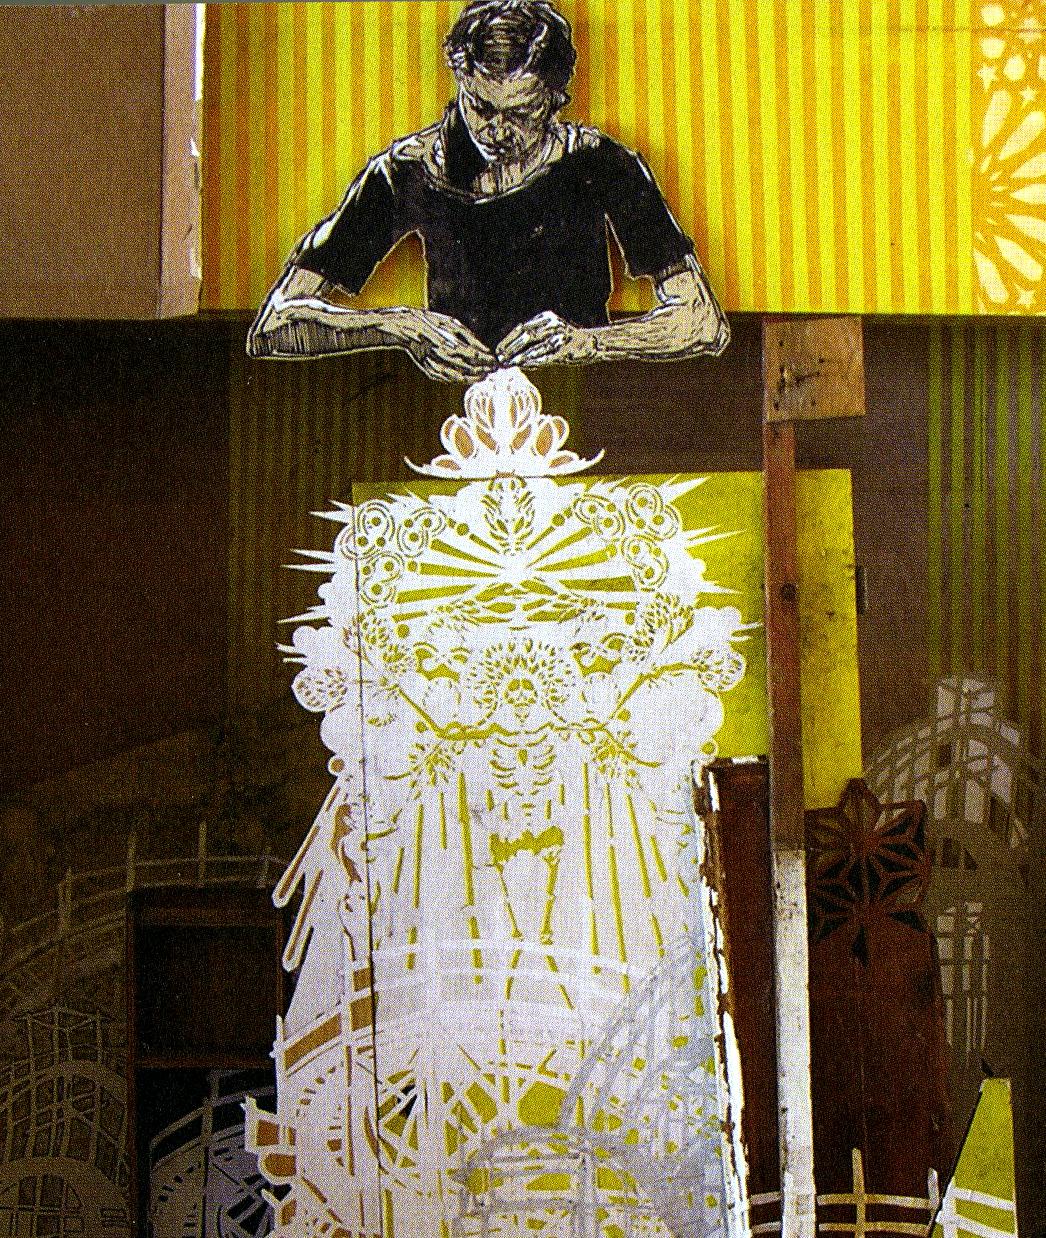 Swoon, Alison the Lace Maker, 2007, 185 x 90 cm, blandteknik